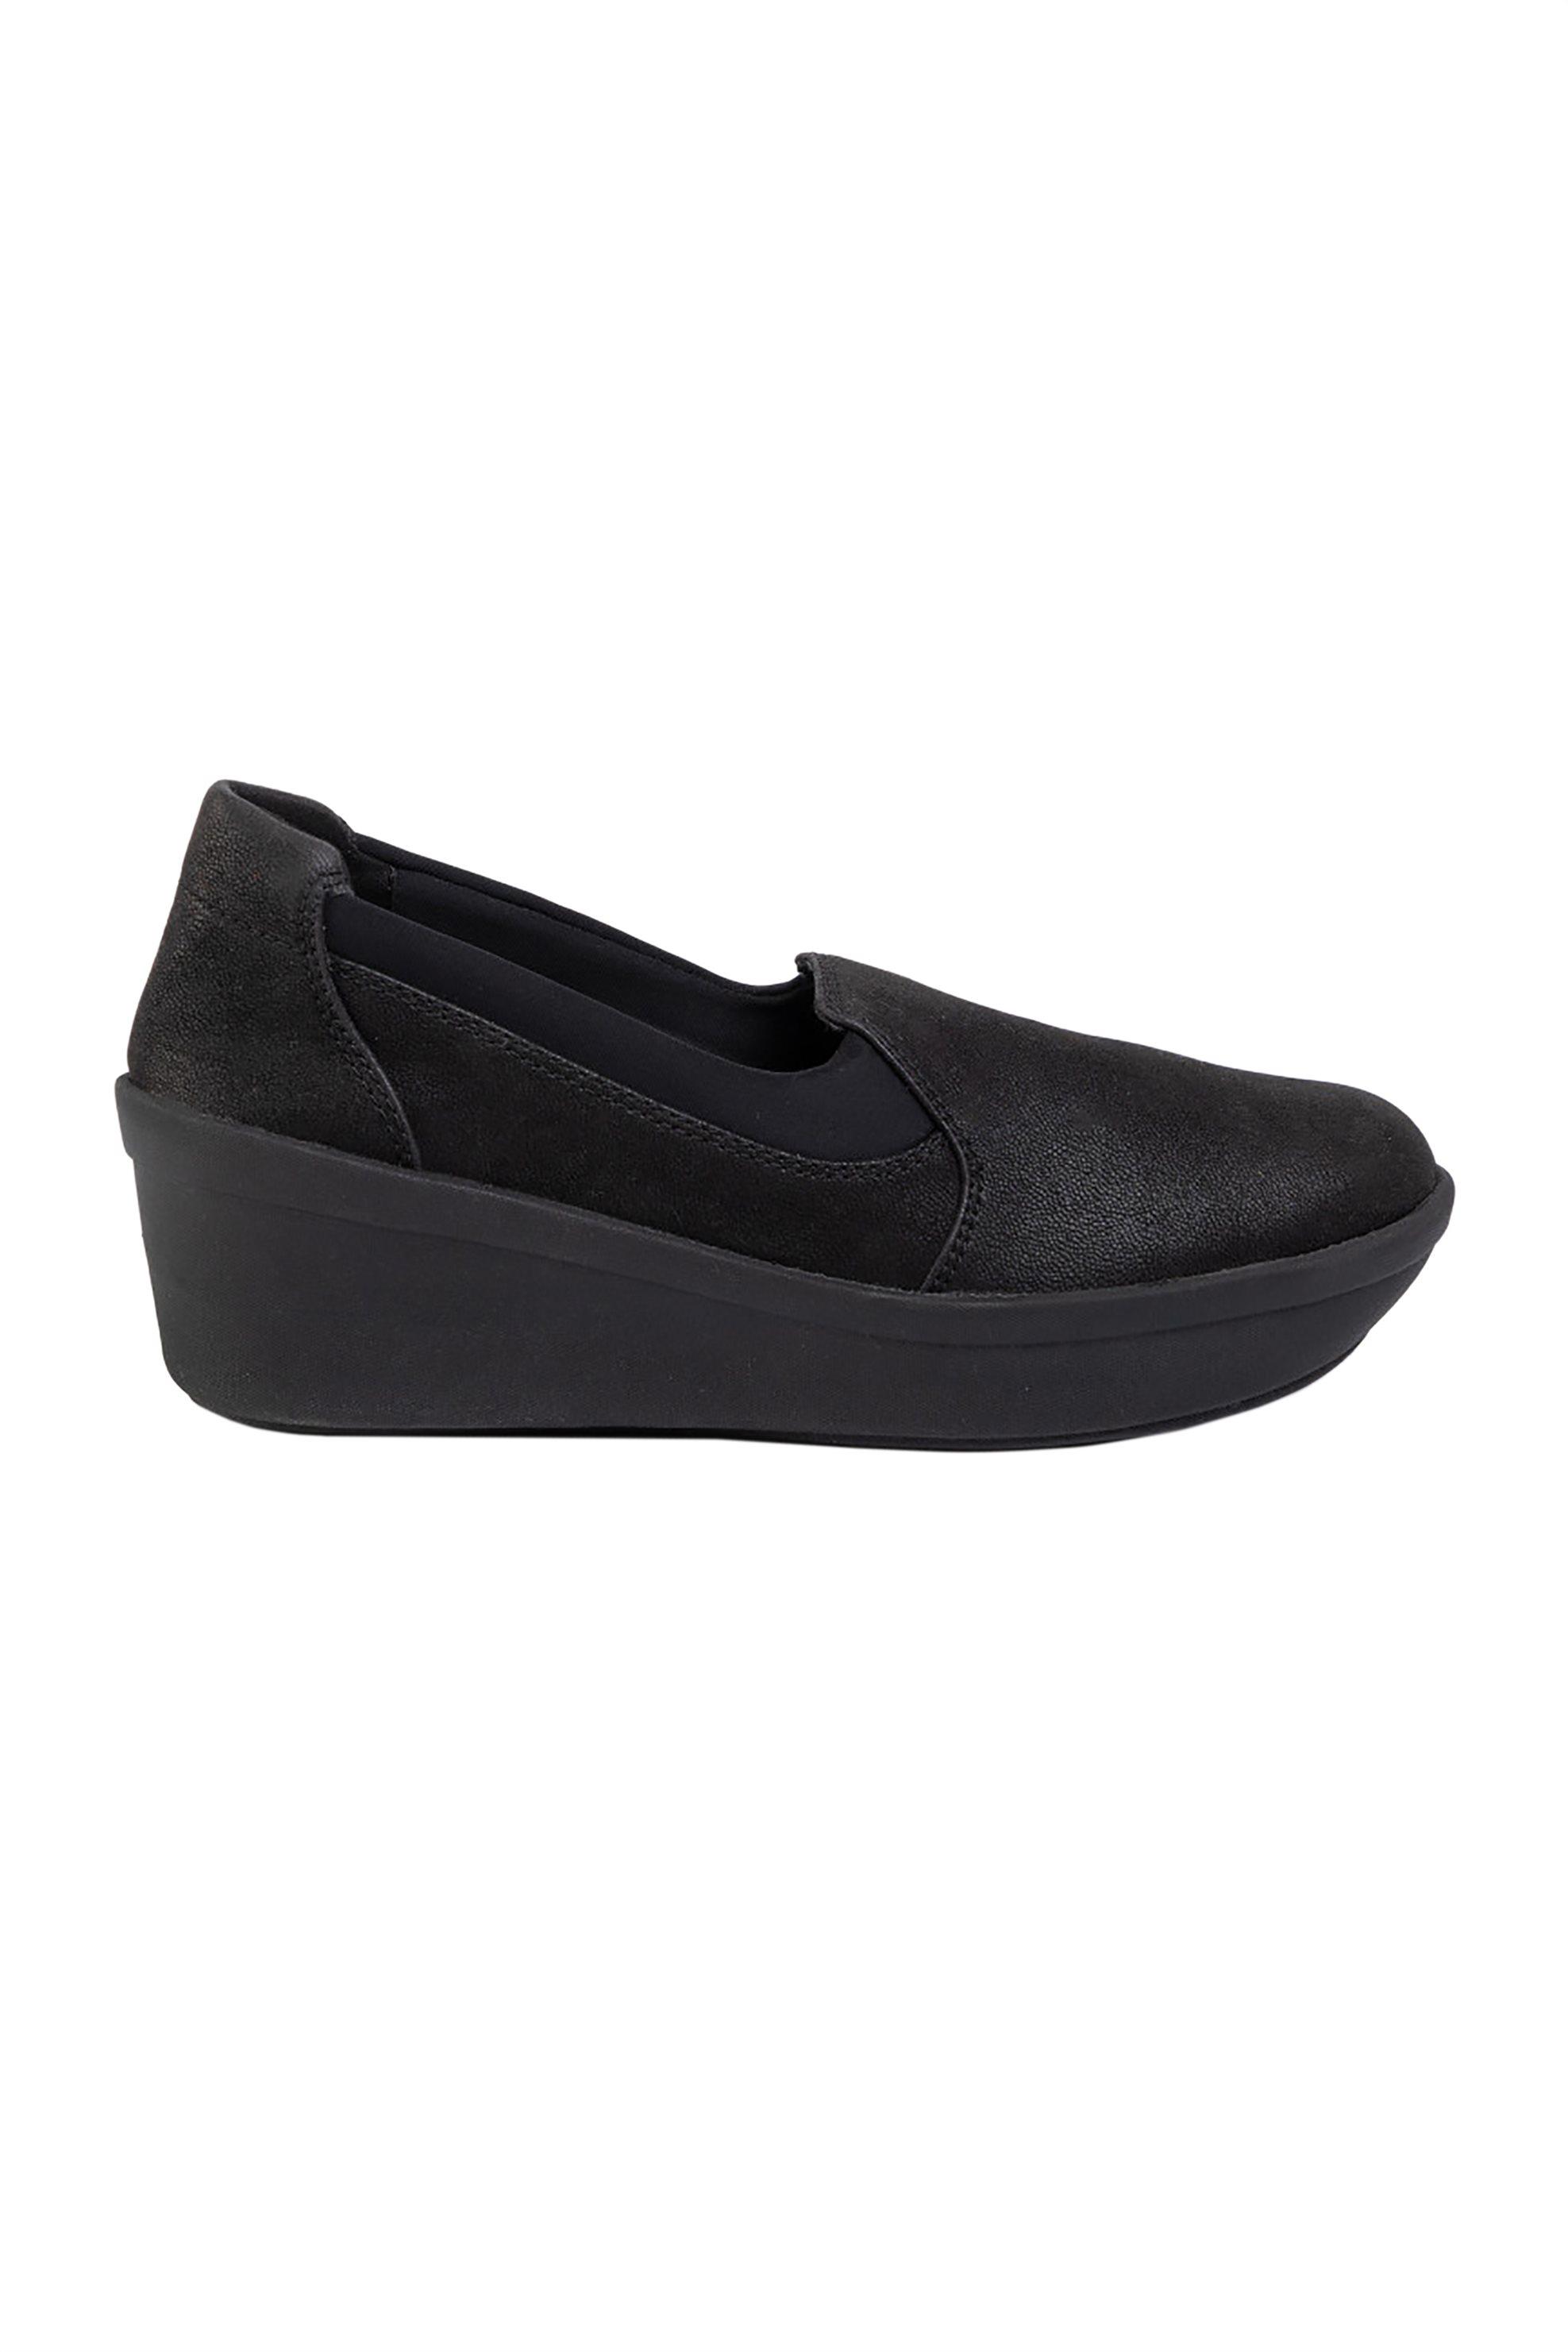 Clarks γυναικεία μονόχρωμα παπούτσια με ενιαίο τακούνι ''Step Rose Moon'' - 26145987 - Μαύρο